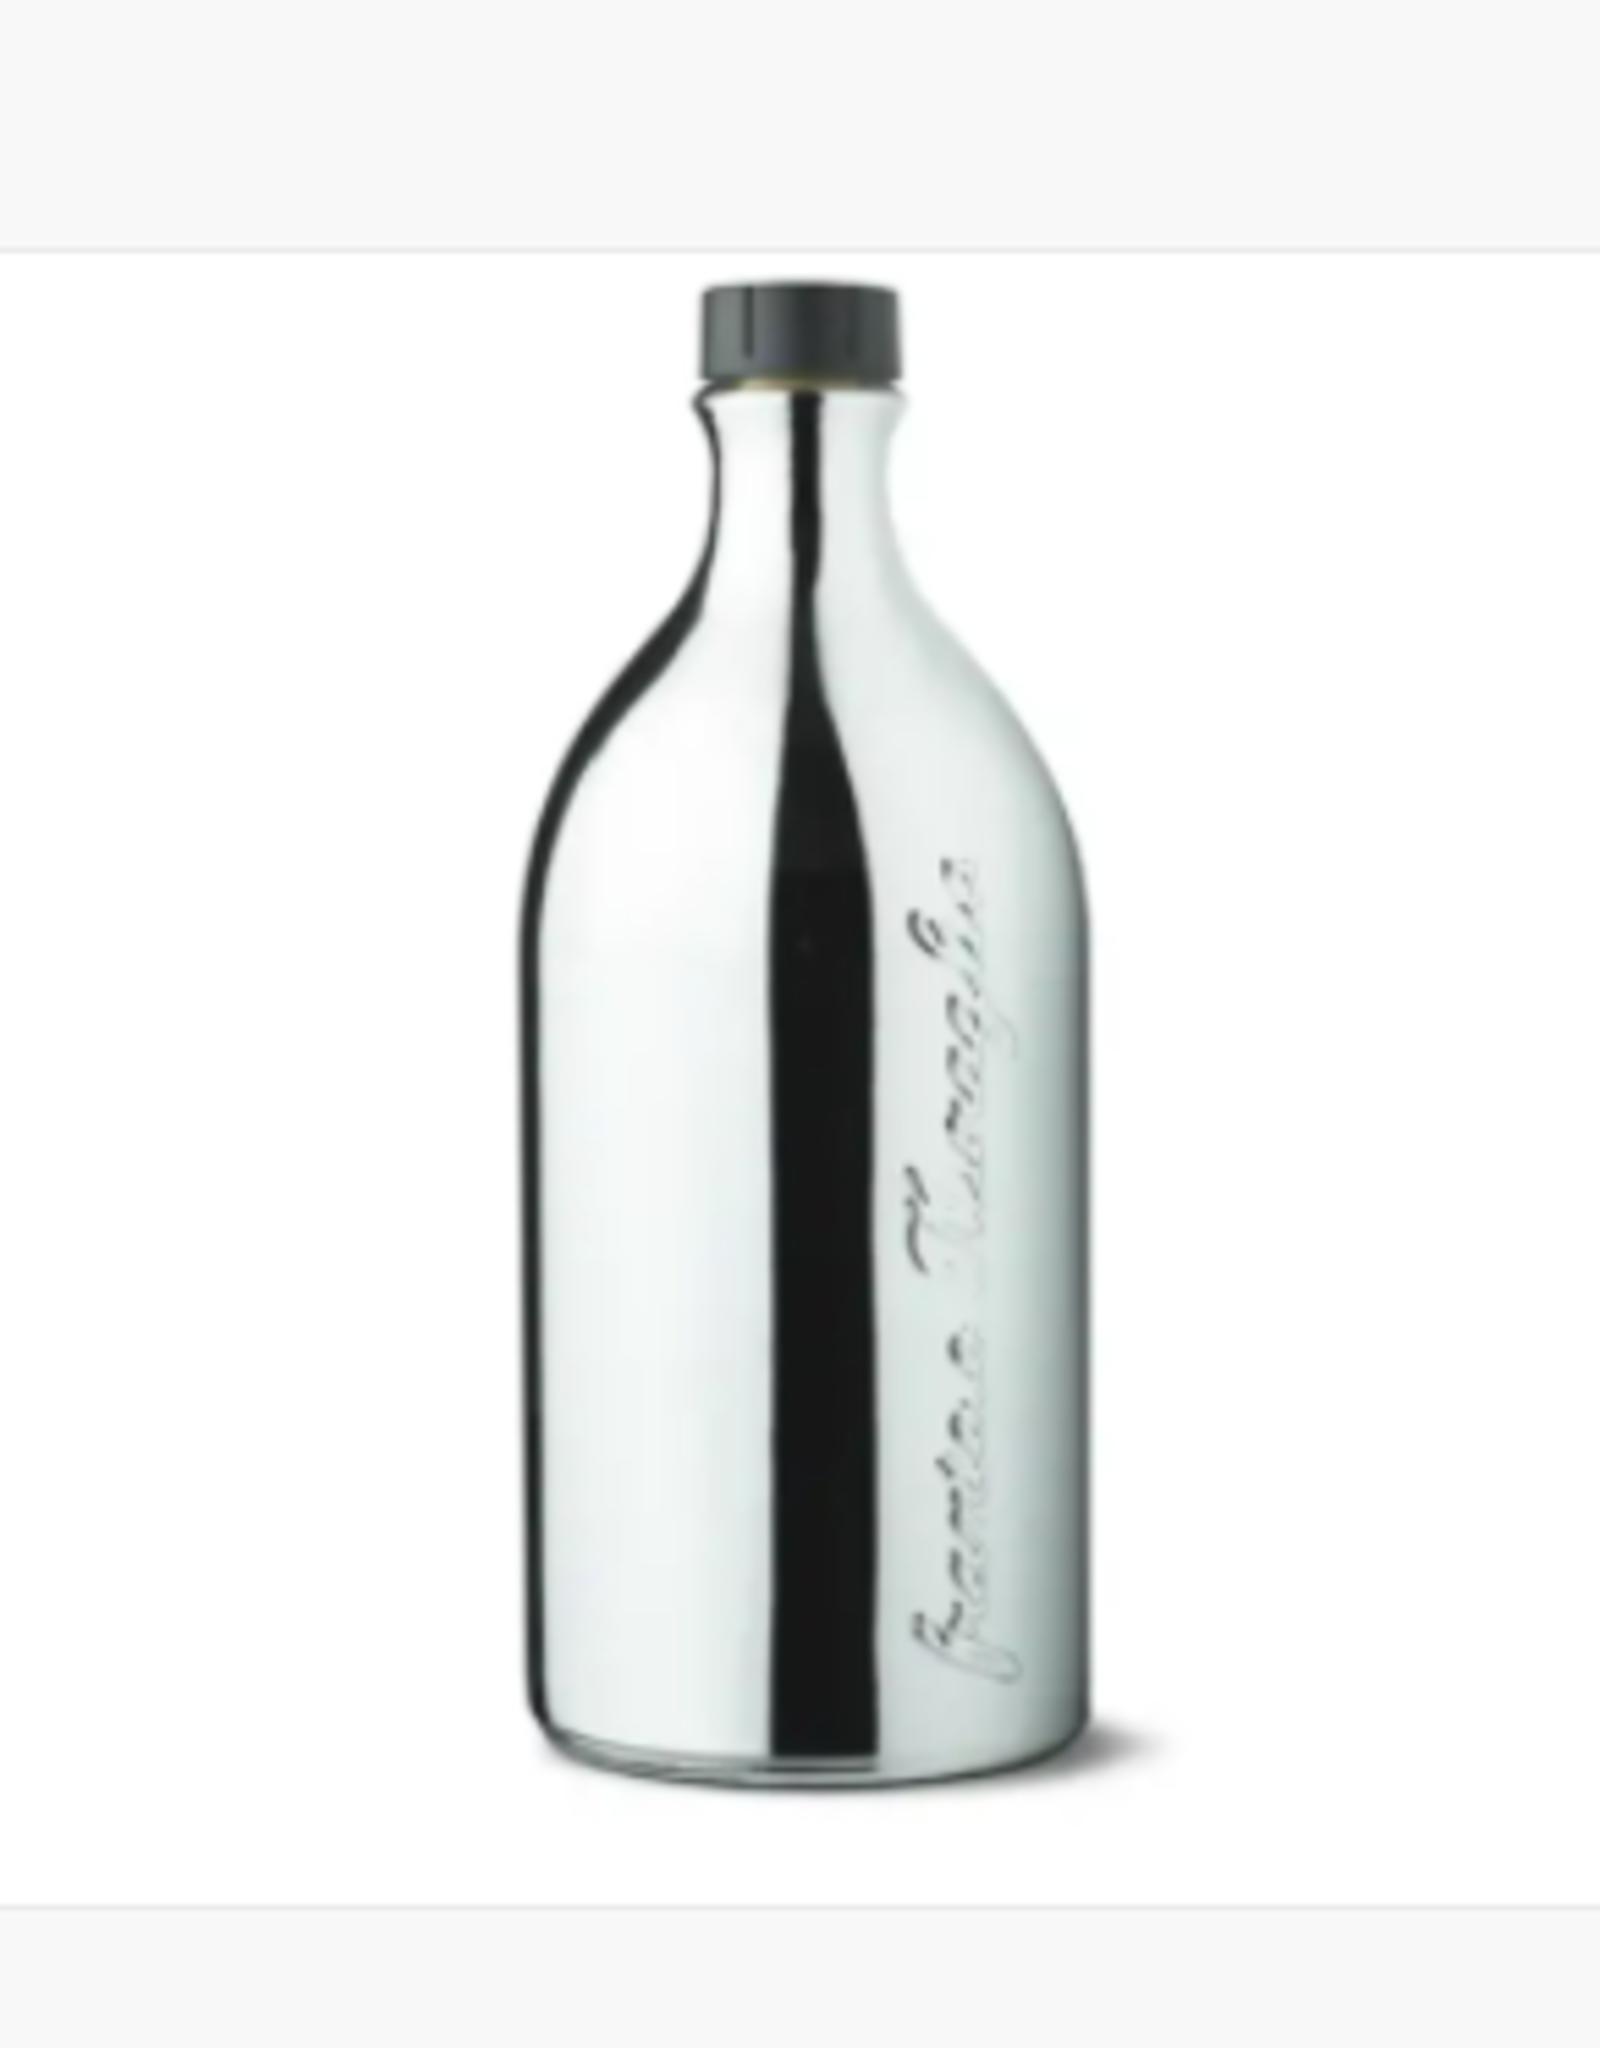 Zia Pia Imports + Italian Kitchen EVOO Glass Bottle - Silver